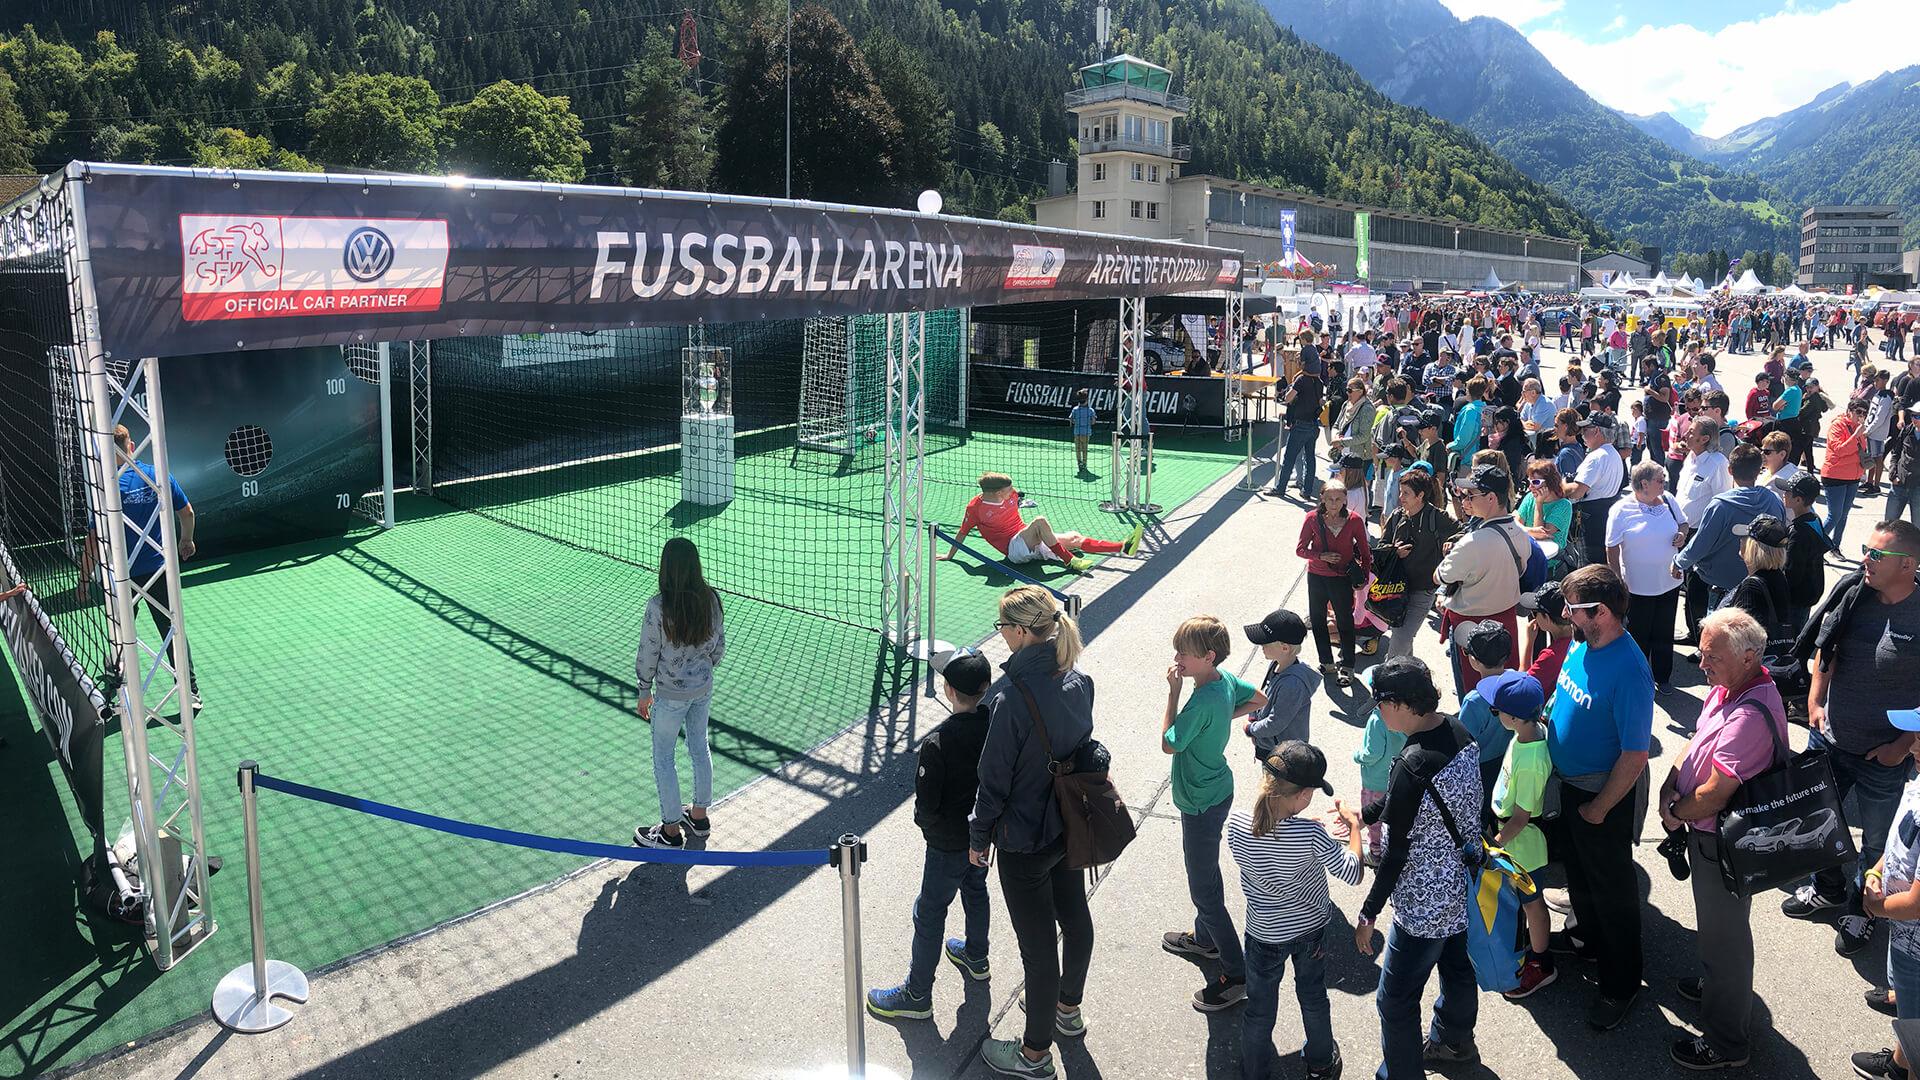 aktivierung-fussball-event-arena-promotion